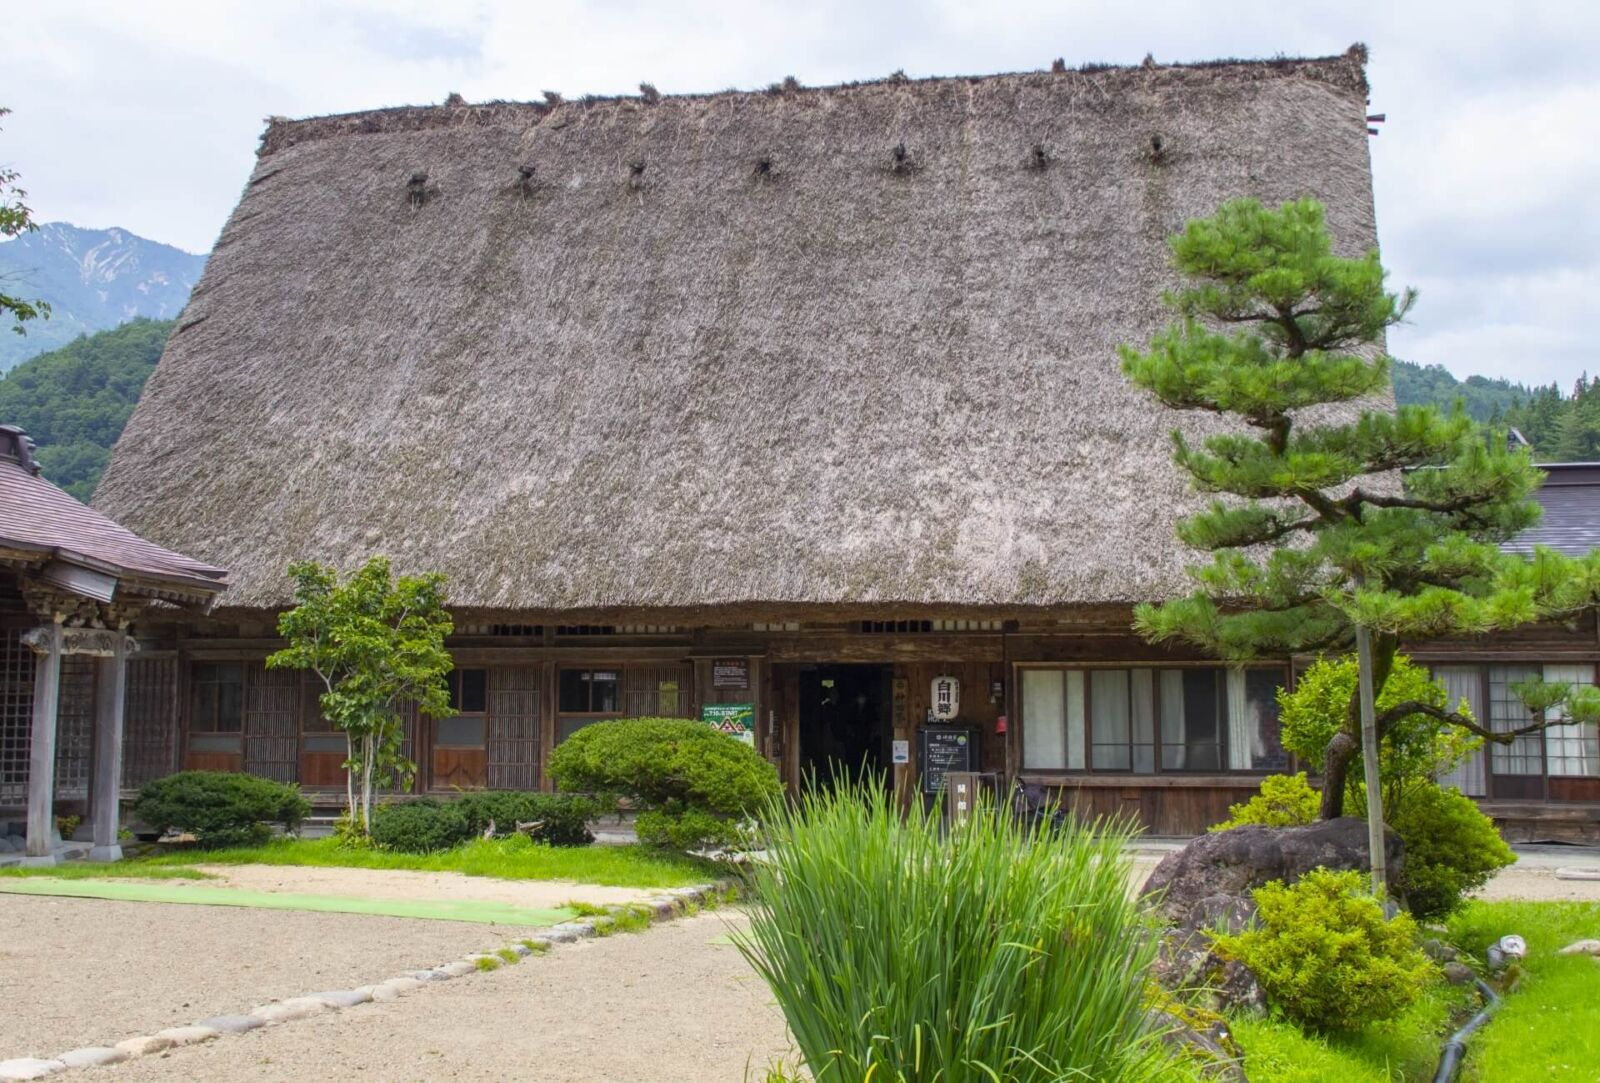 kanda-house-shirakawago